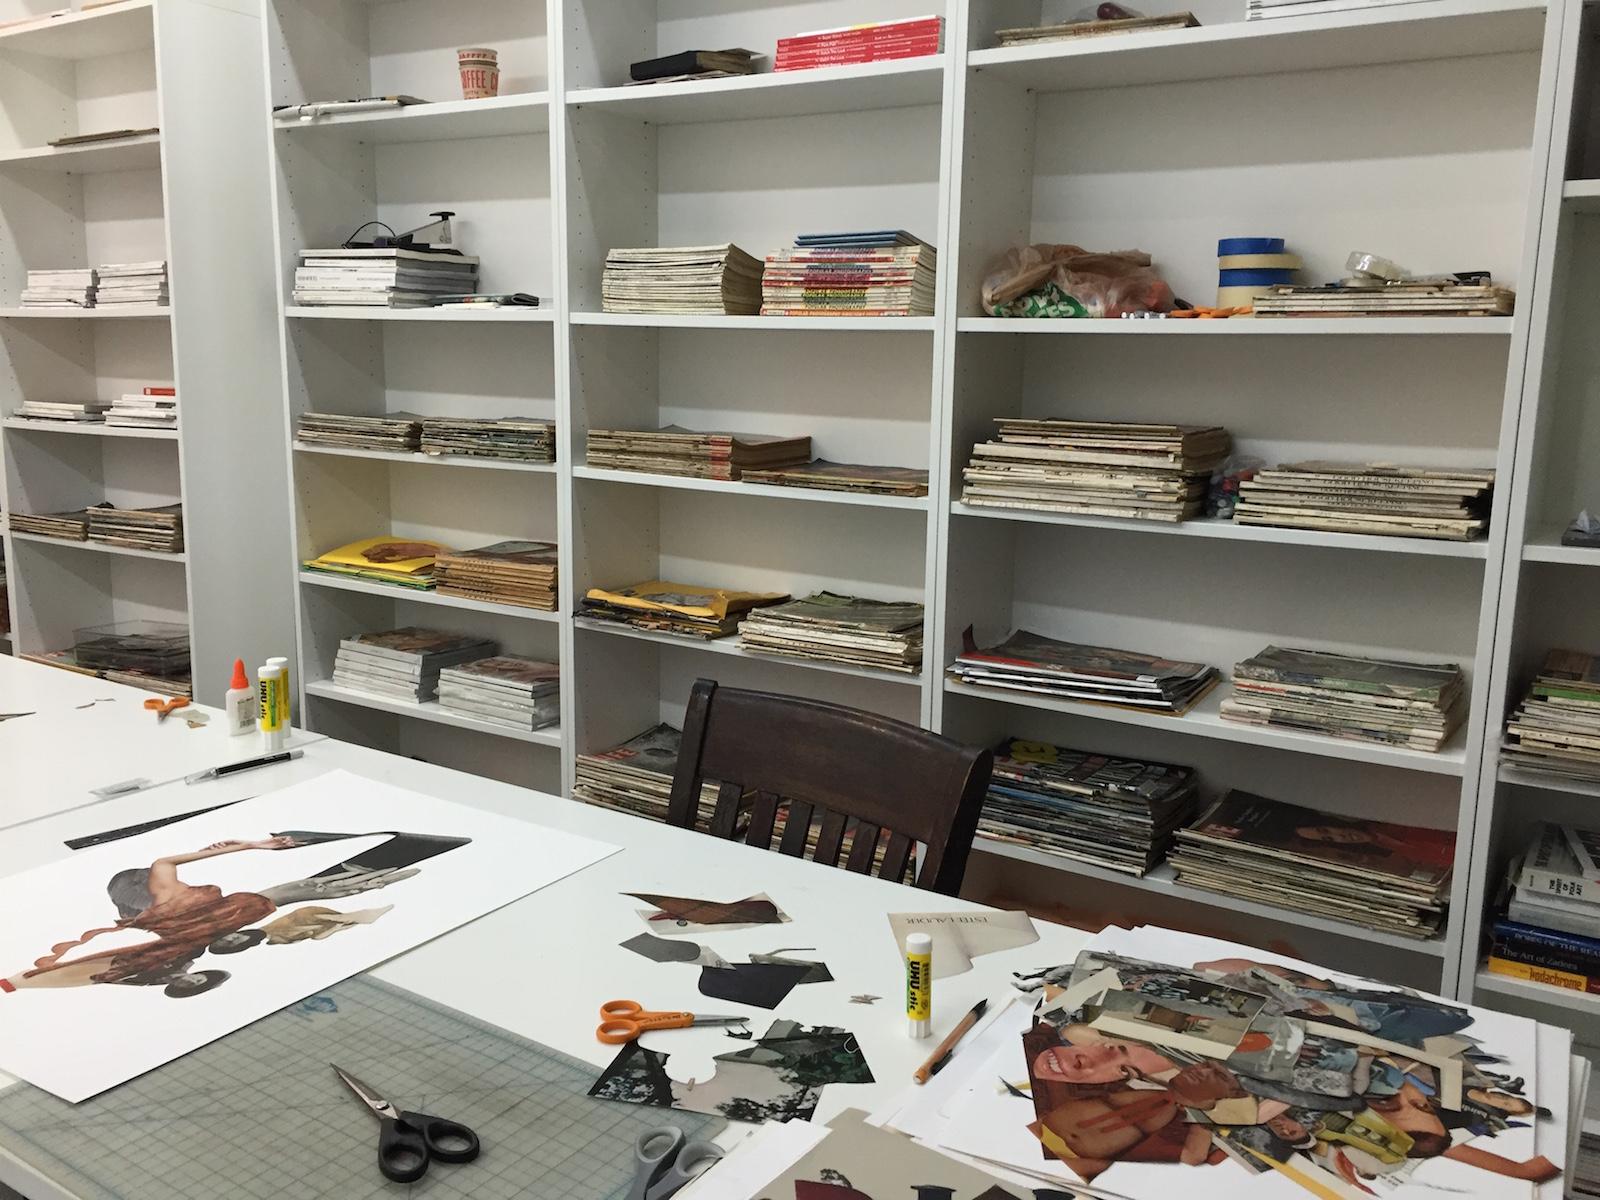 michael desutter // studio space // brooklyn, new york